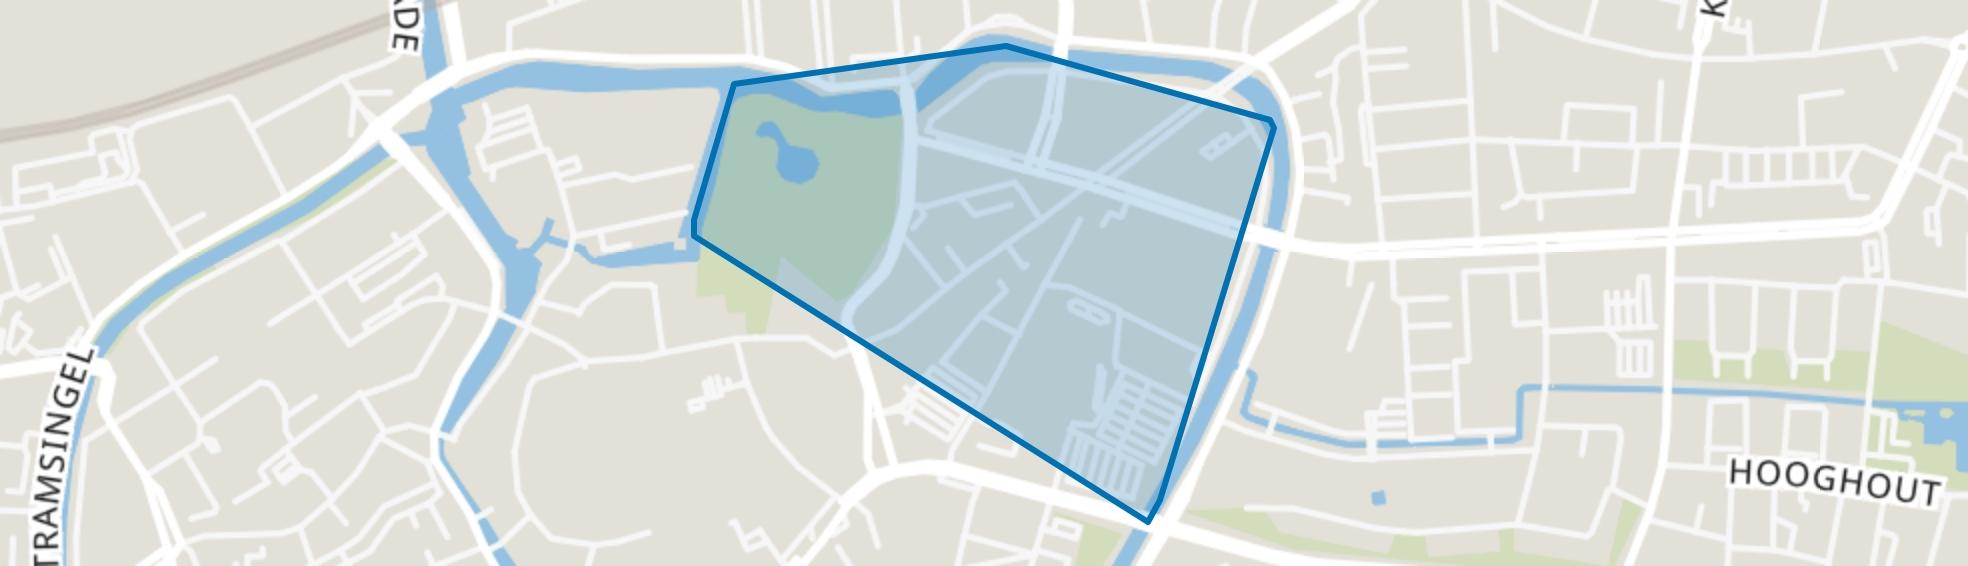 Valkenberg, Breda map